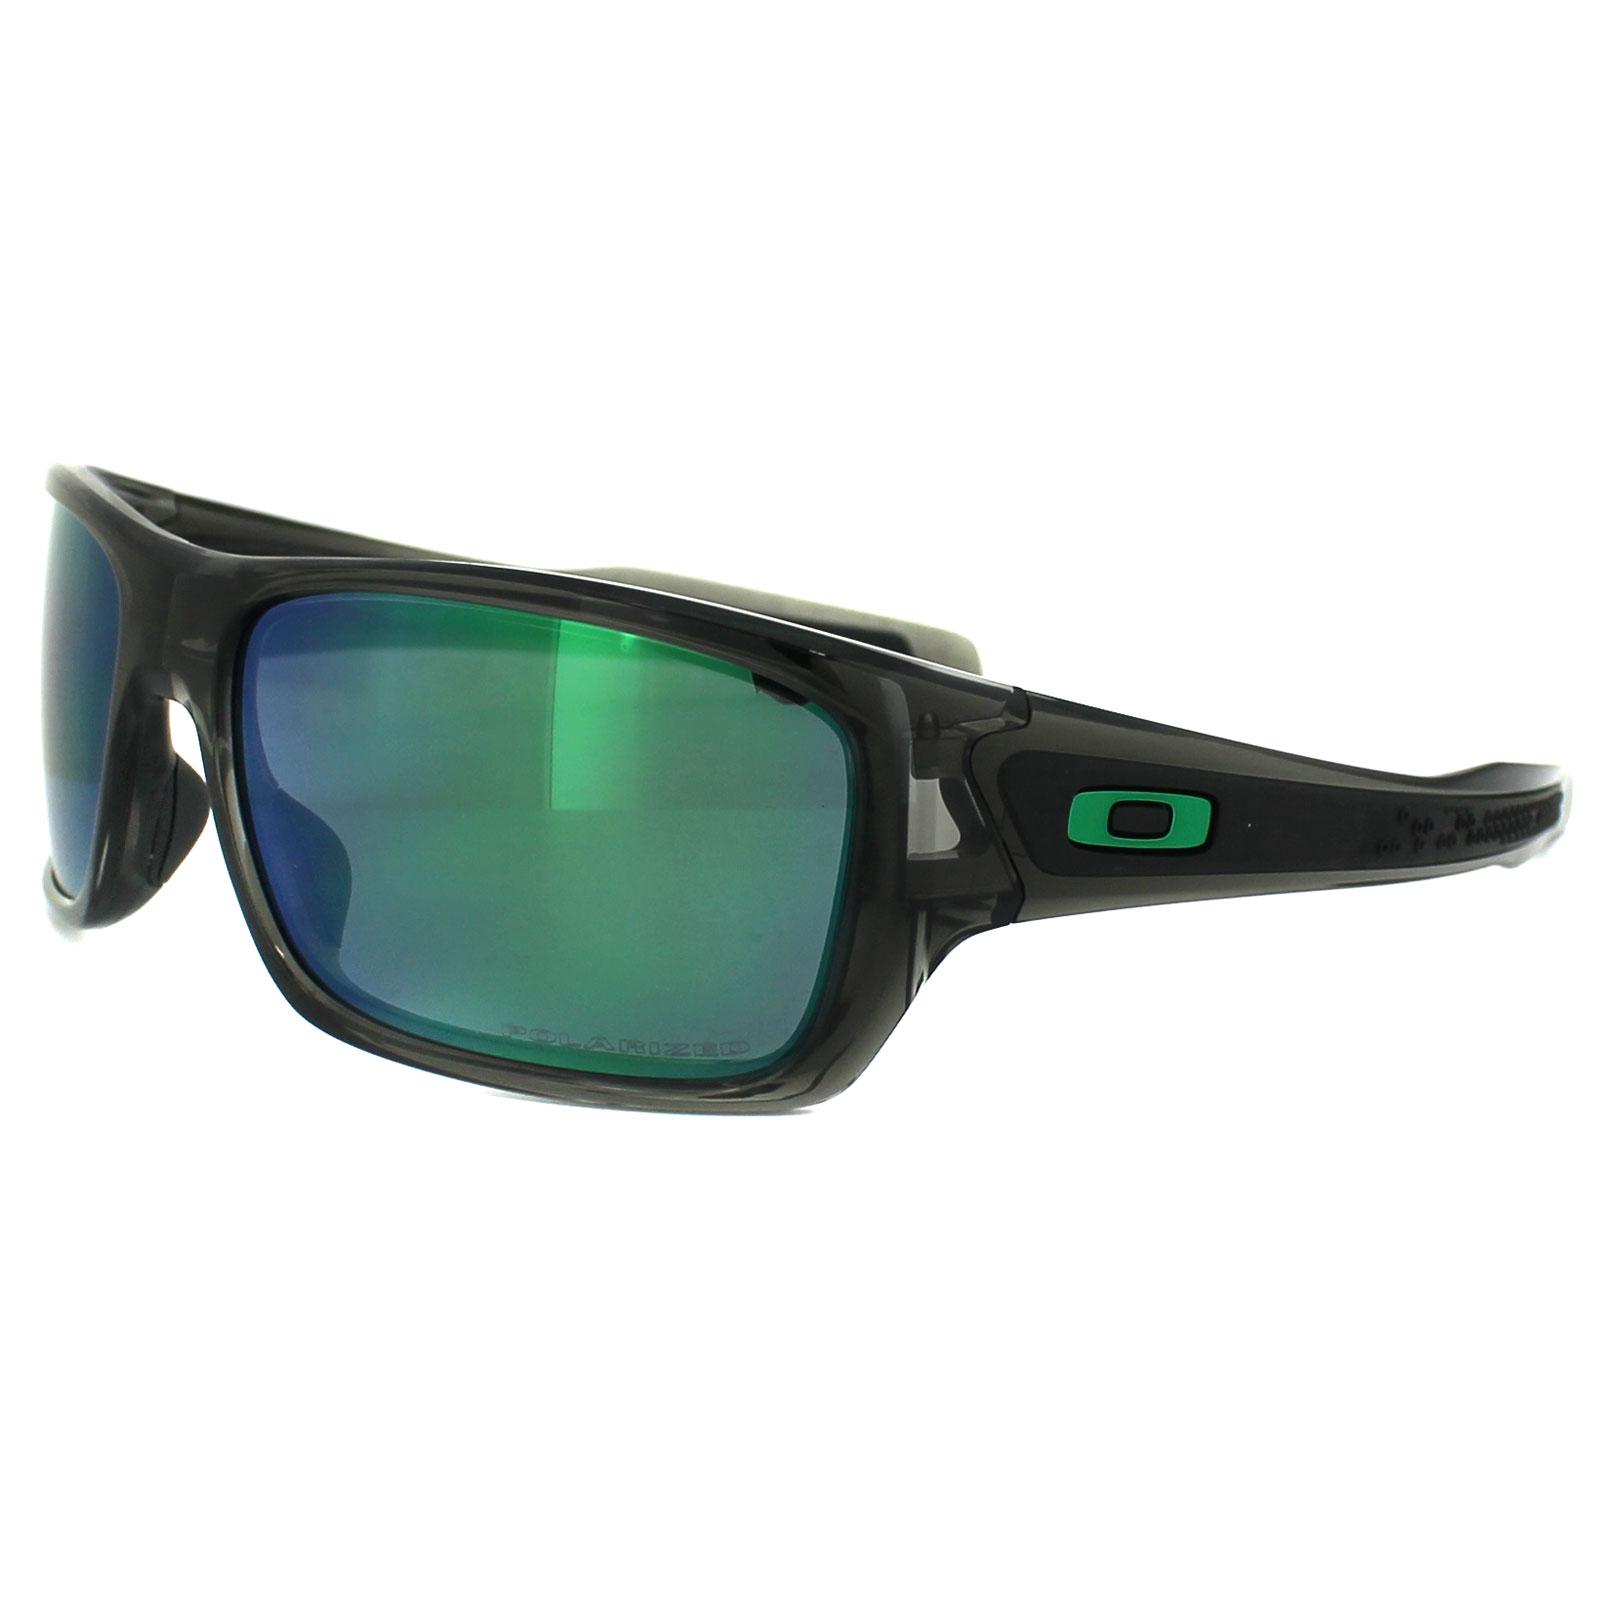 5e6fa182b9 Sentinel Oakley Sunglasses Turbine OO9263-09 Grey Smoke Jade Iridium  Polarized